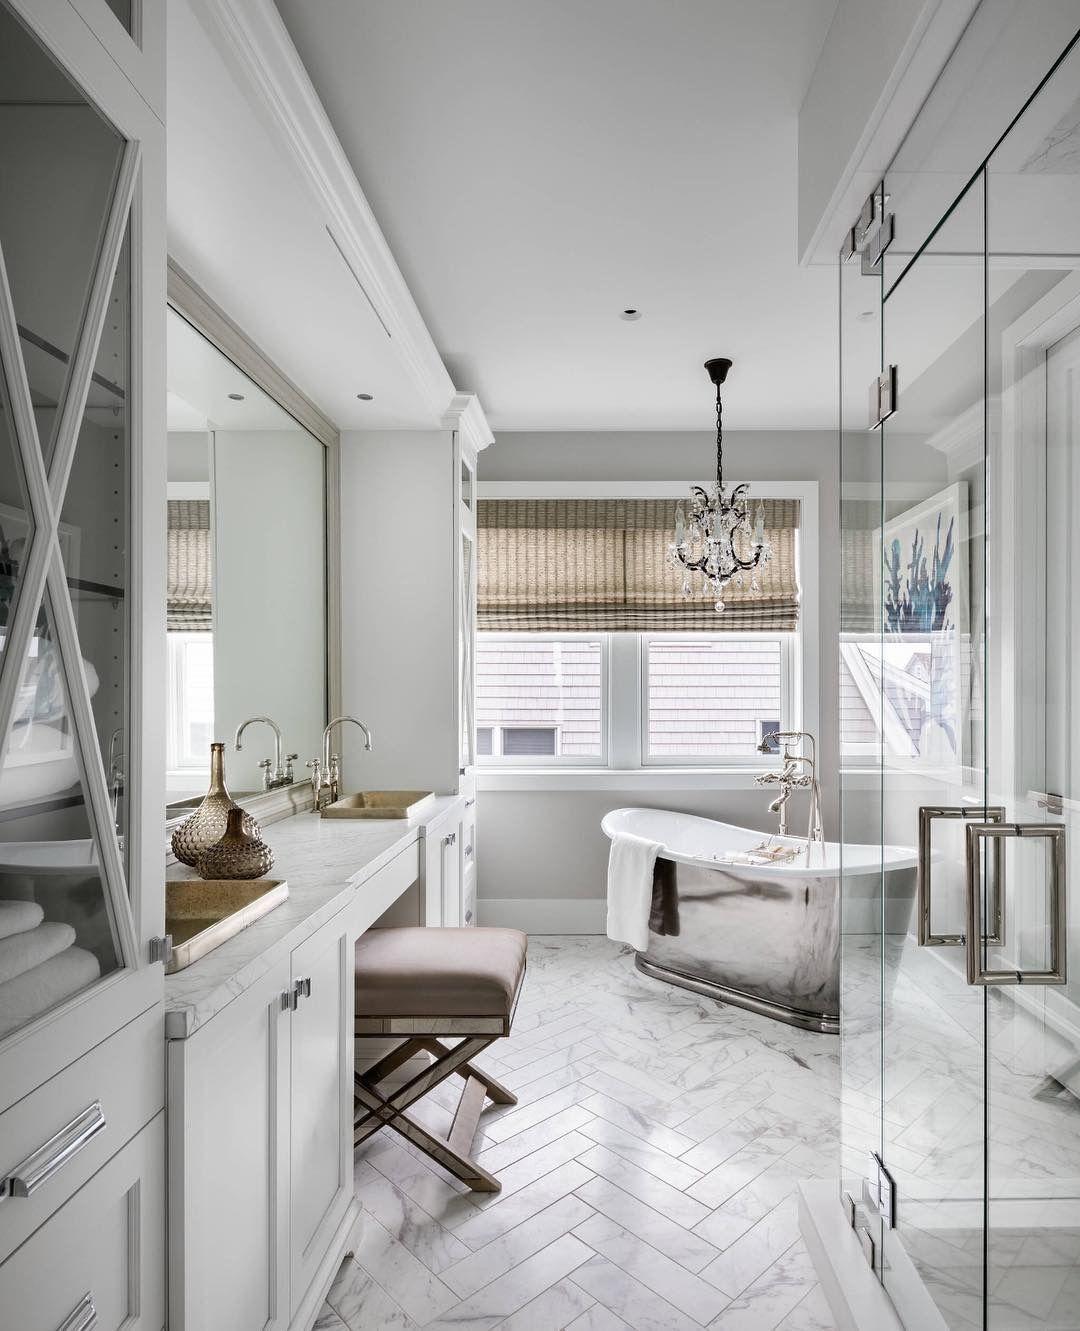 pindaniel guilyardi on অভ্যন্তরীণ ডিজাইন - হোম জন্য আইডিয়াস | unique bathroom vanity, best